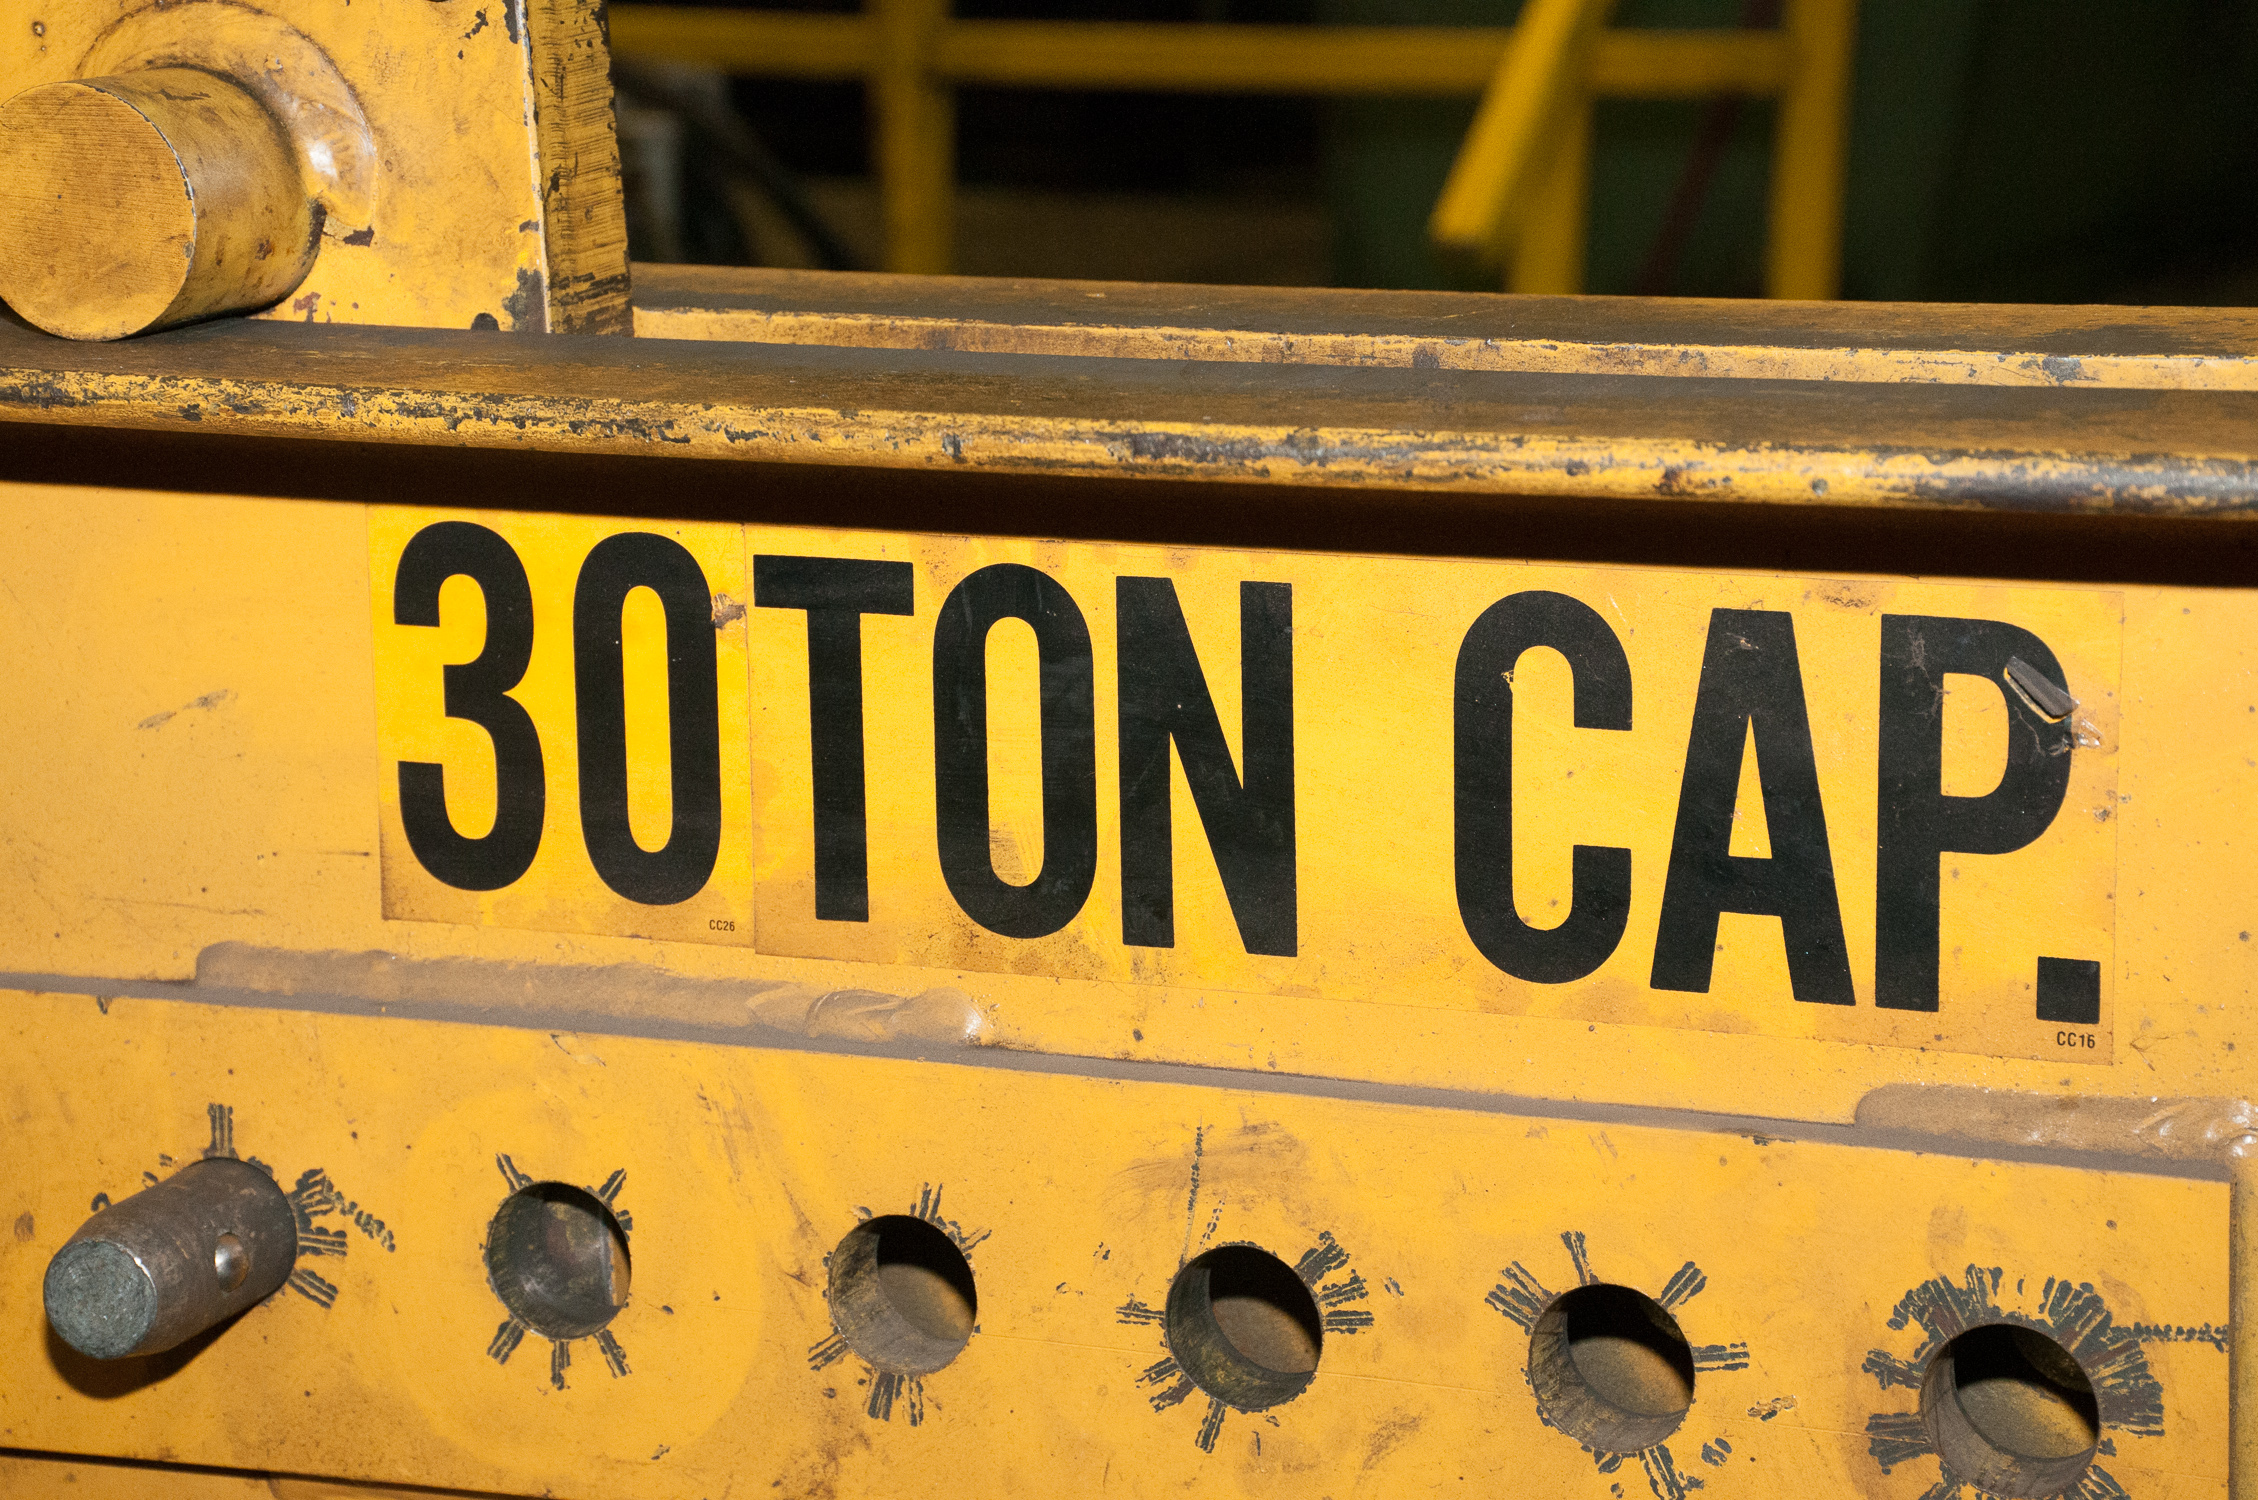 "Caldwell Co 30 Ton Spreader Bar adjustable 24""-72"" For Crane - Image 4 of 4"